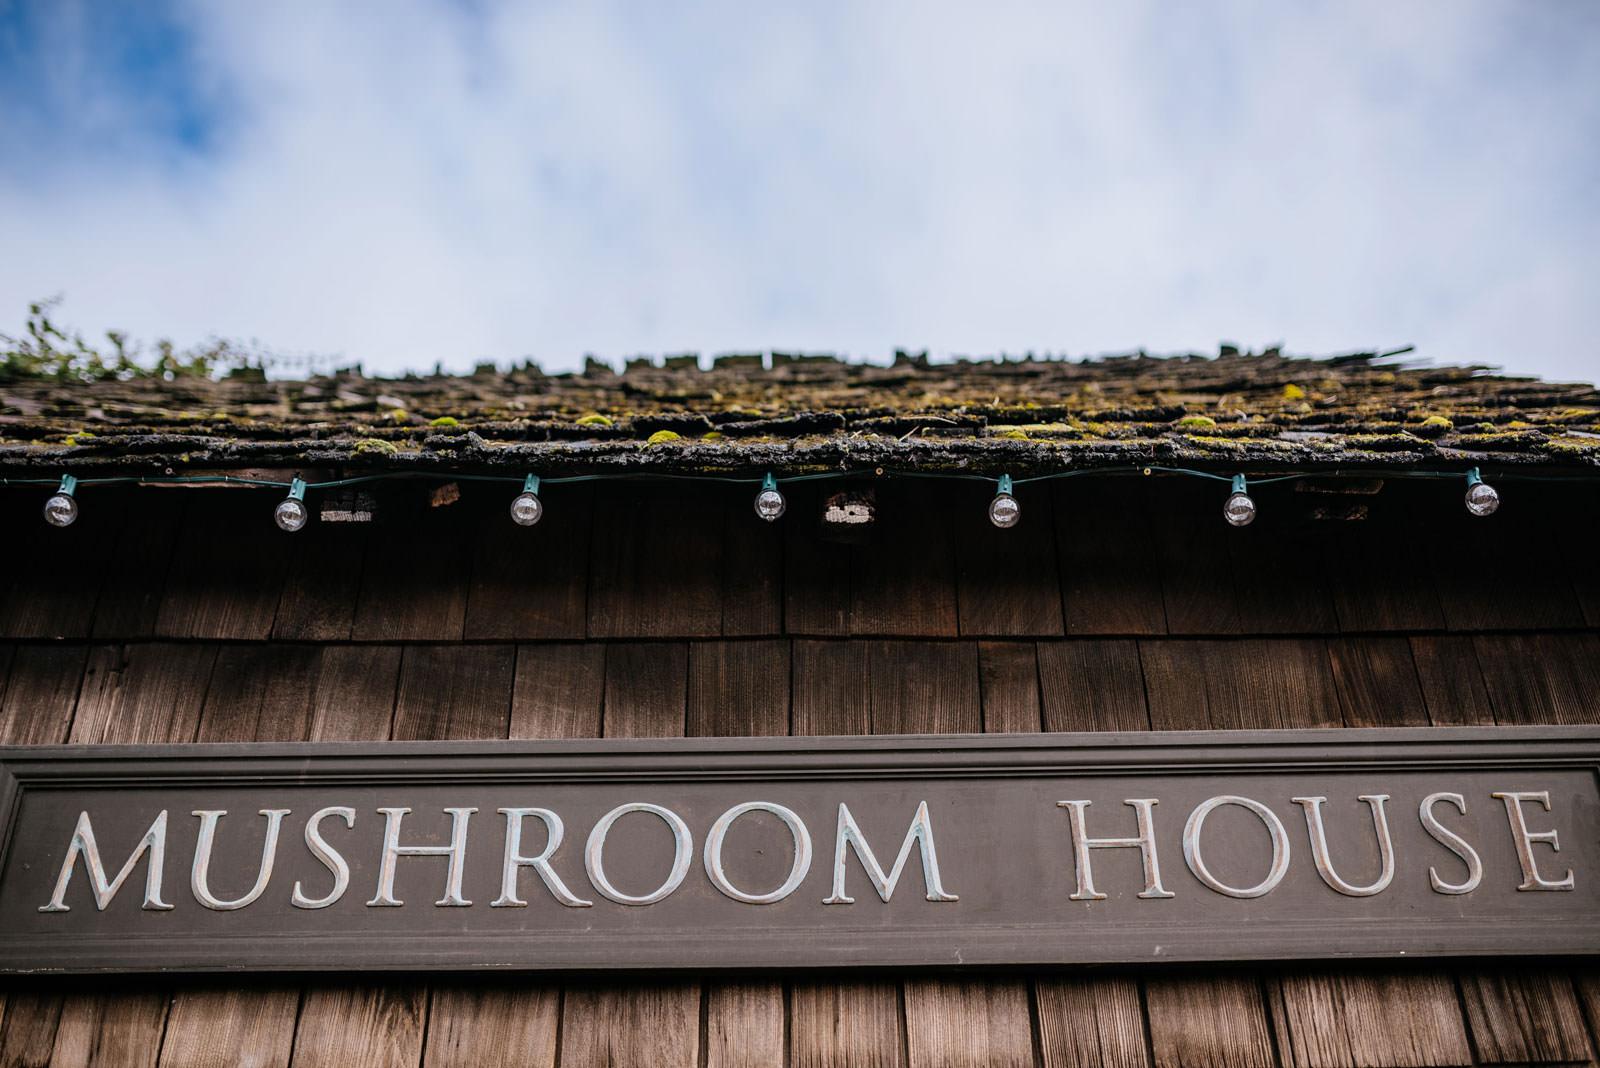 mushroom house at terrain philadelphia